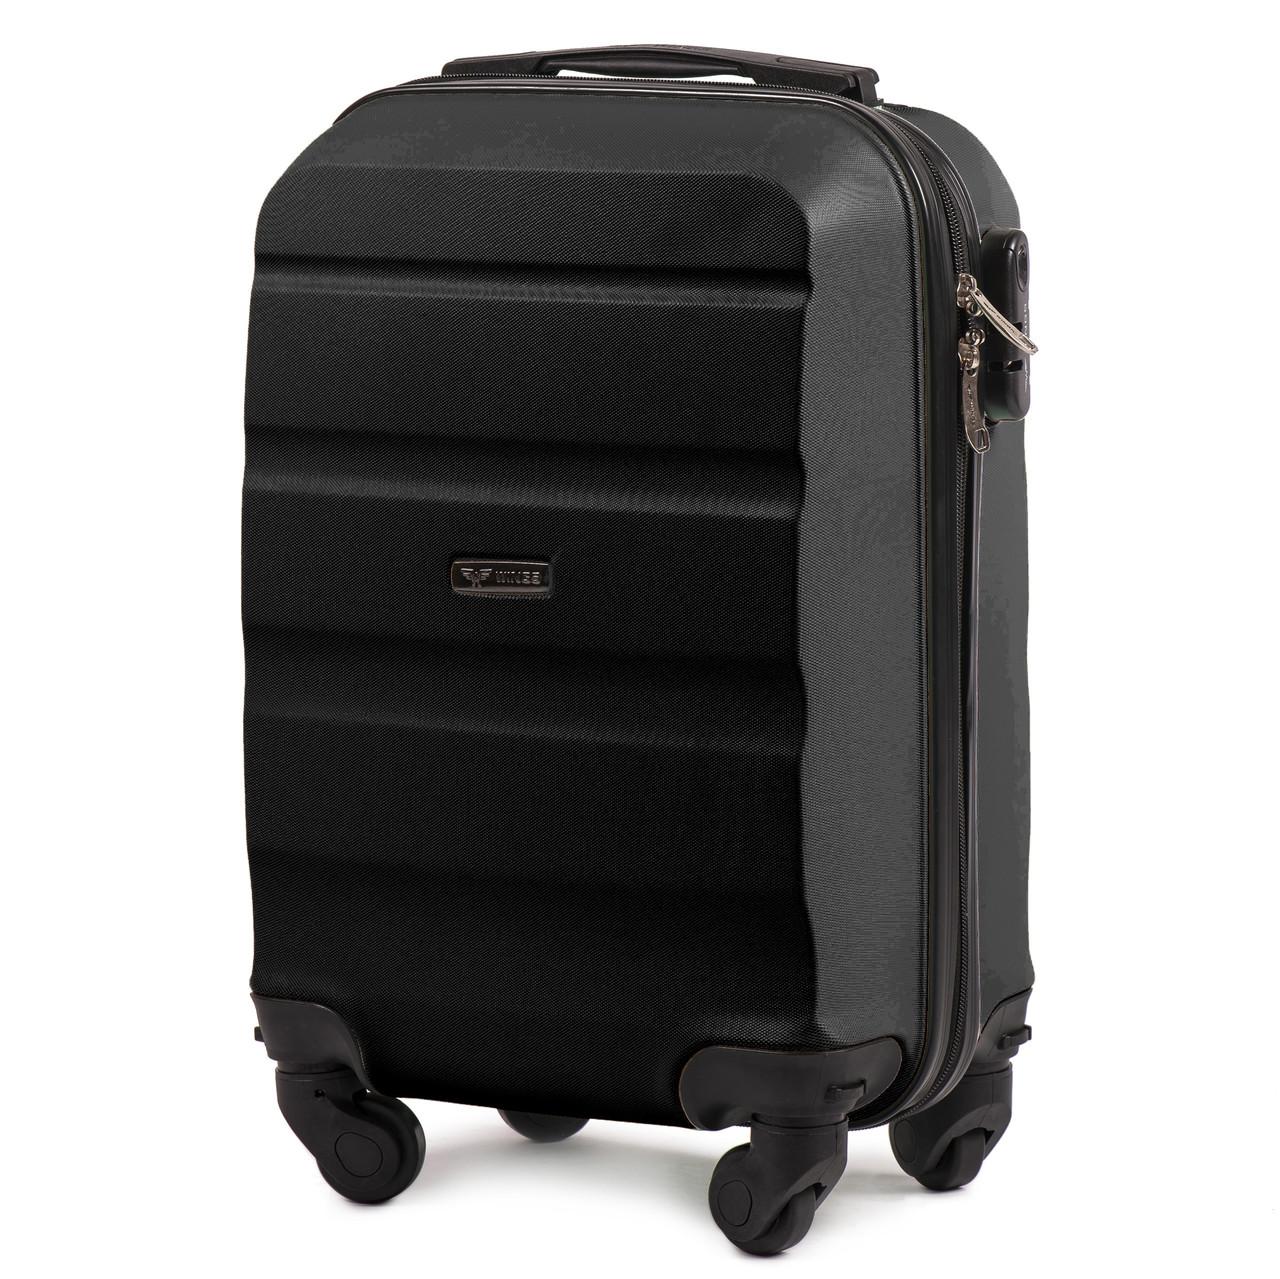 5db776002f4f Чемодан Wings AT01 мини ручная кладь на 4 колесах Черный - Bag Travel Box в  Одессе